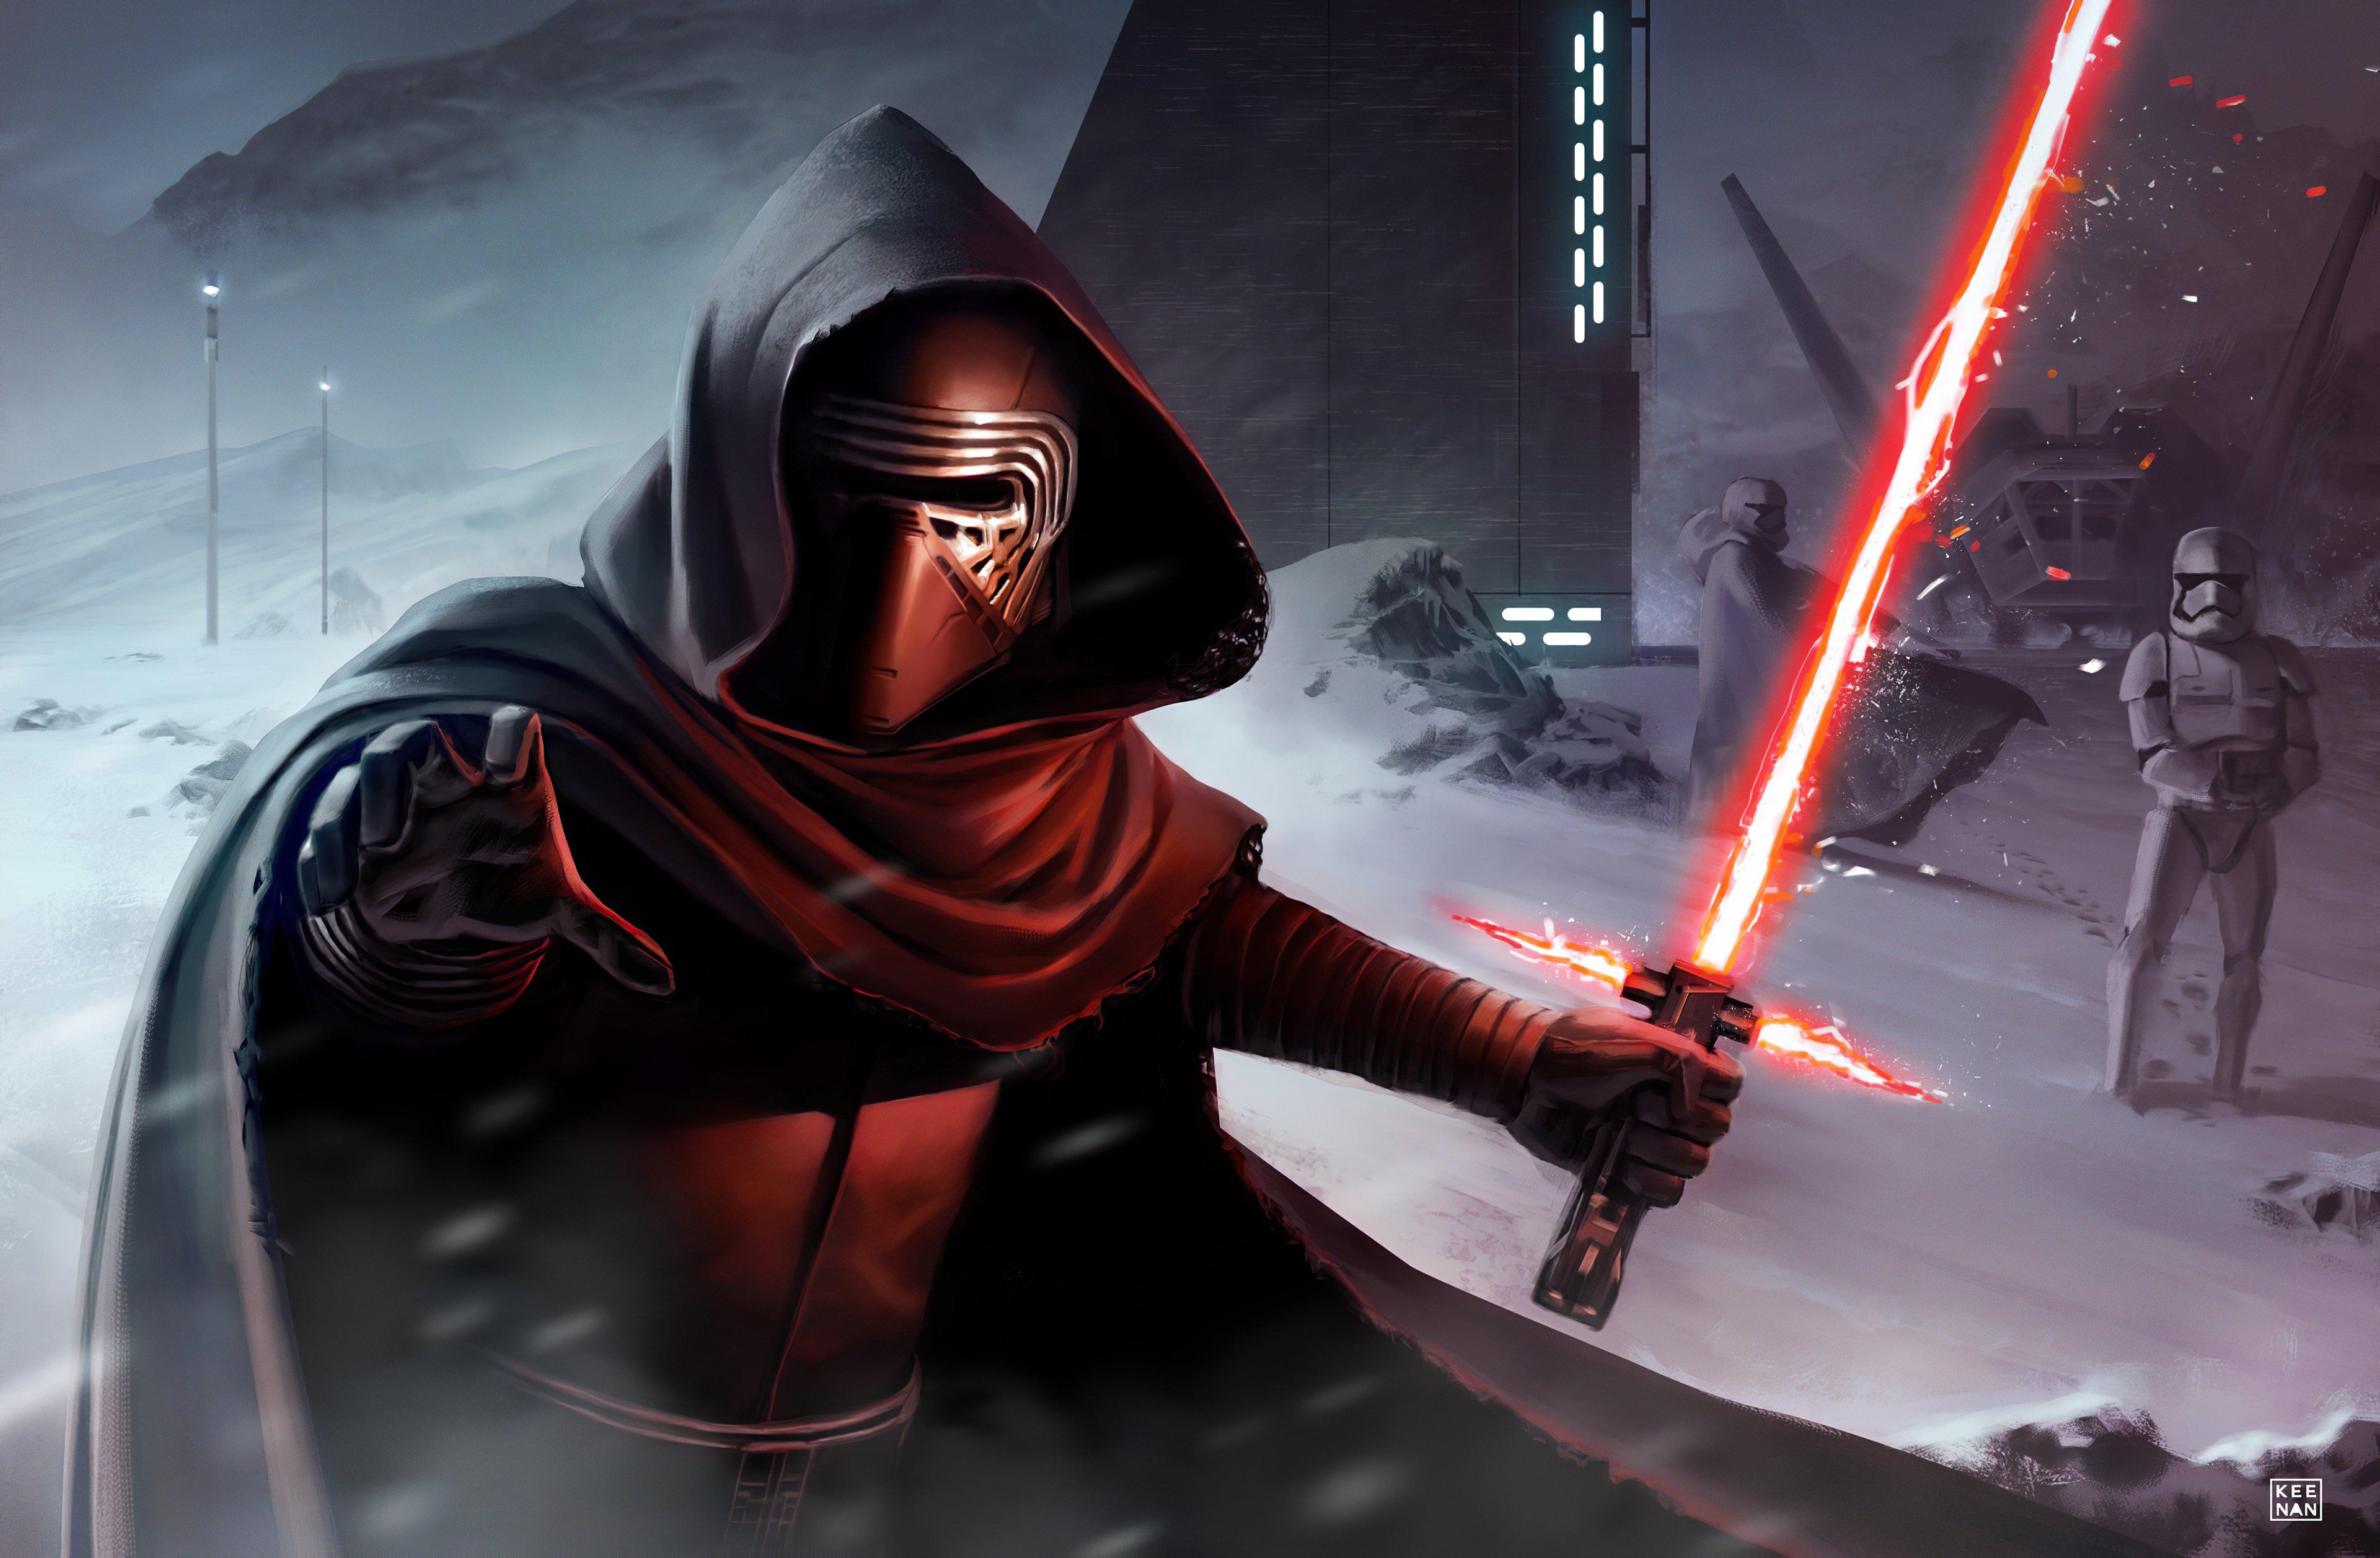 Fondos de pantalla Kylo Ren de Star Wars